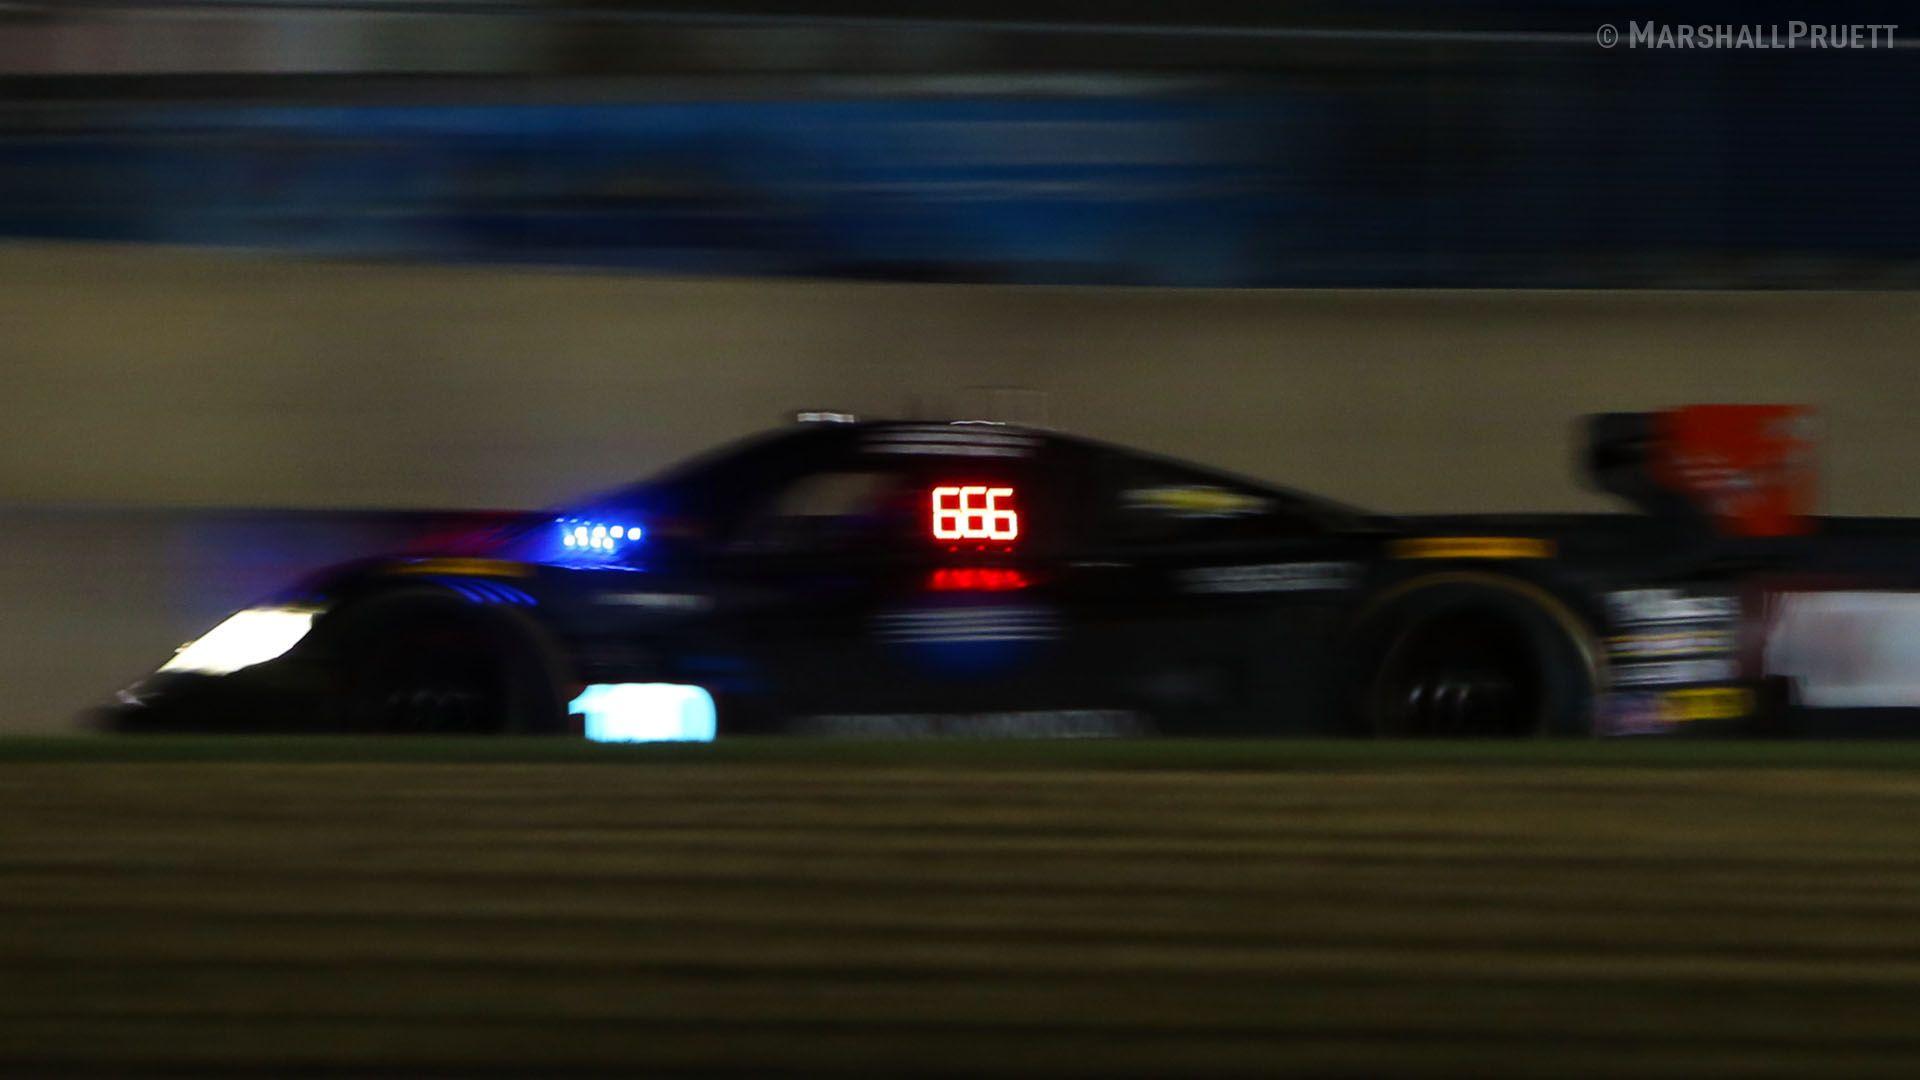 Marshall Pruetts Best Motorsport Photos Of 2014 Police Lights Circuit Electronic Circuits Pinterest